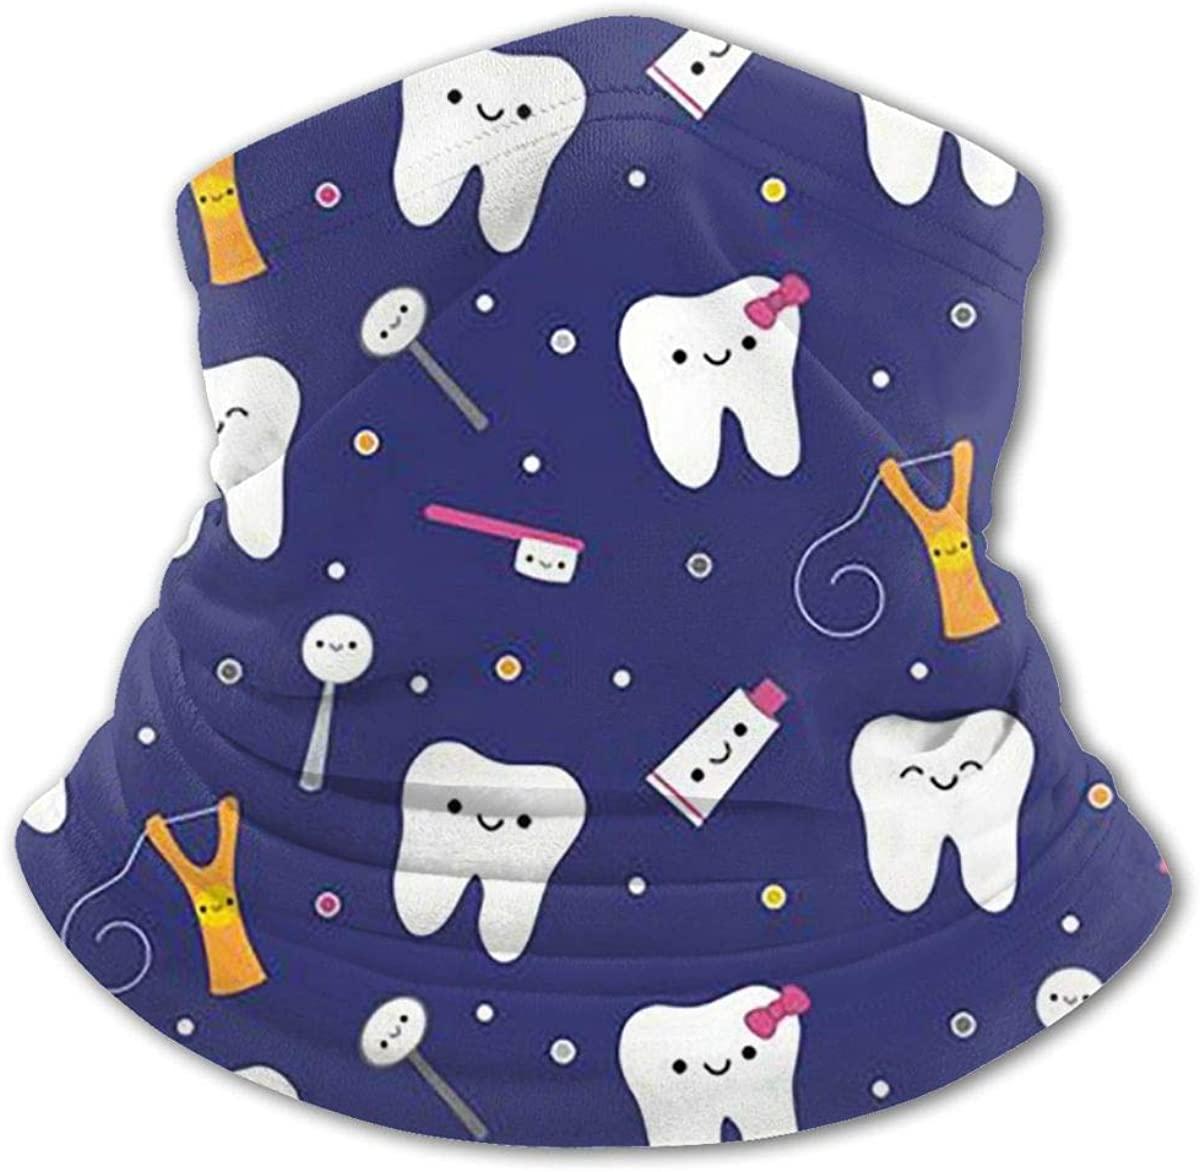 Protect Teeth Headwear For Girls And Boys, Head Wrap, Neck Gaiter, Headband, Tenn Fishing Mask, Magic Scarf, Tube Mask, Face Bandana Mask For Camping Running Cycling